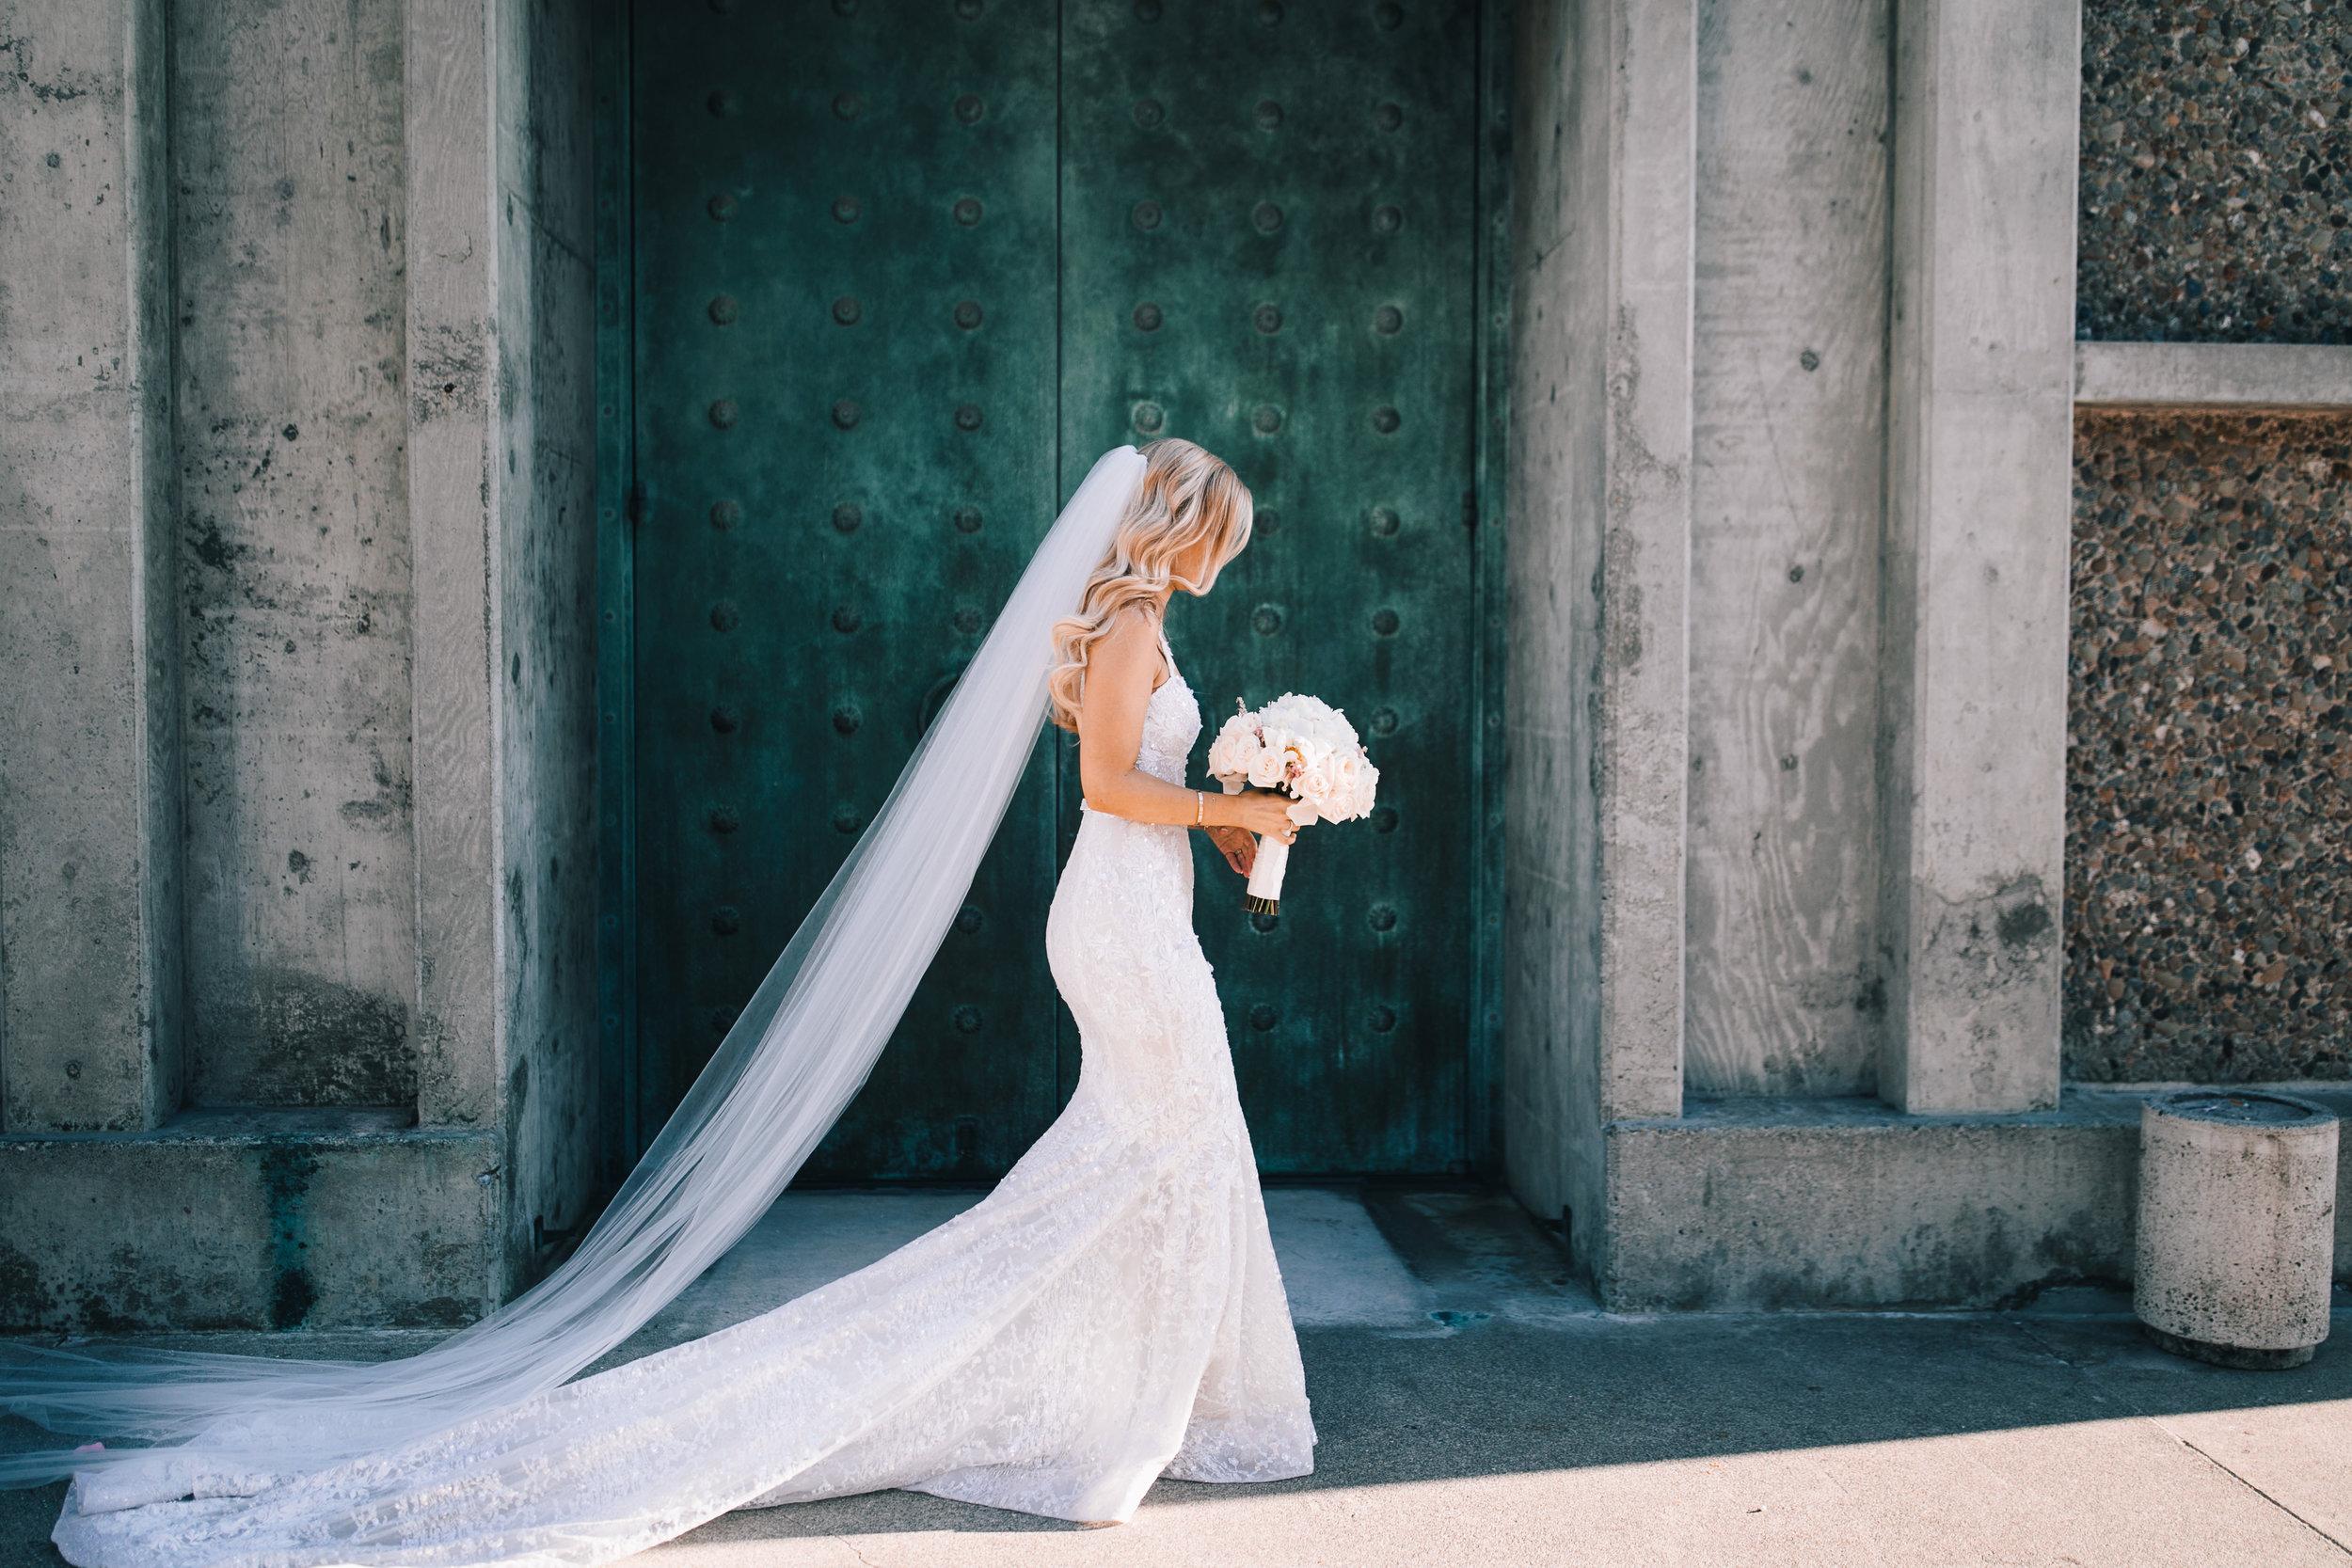 2018.09.08 Litsa and Sofo Greek Wedding Sneak Peak-7.jpg